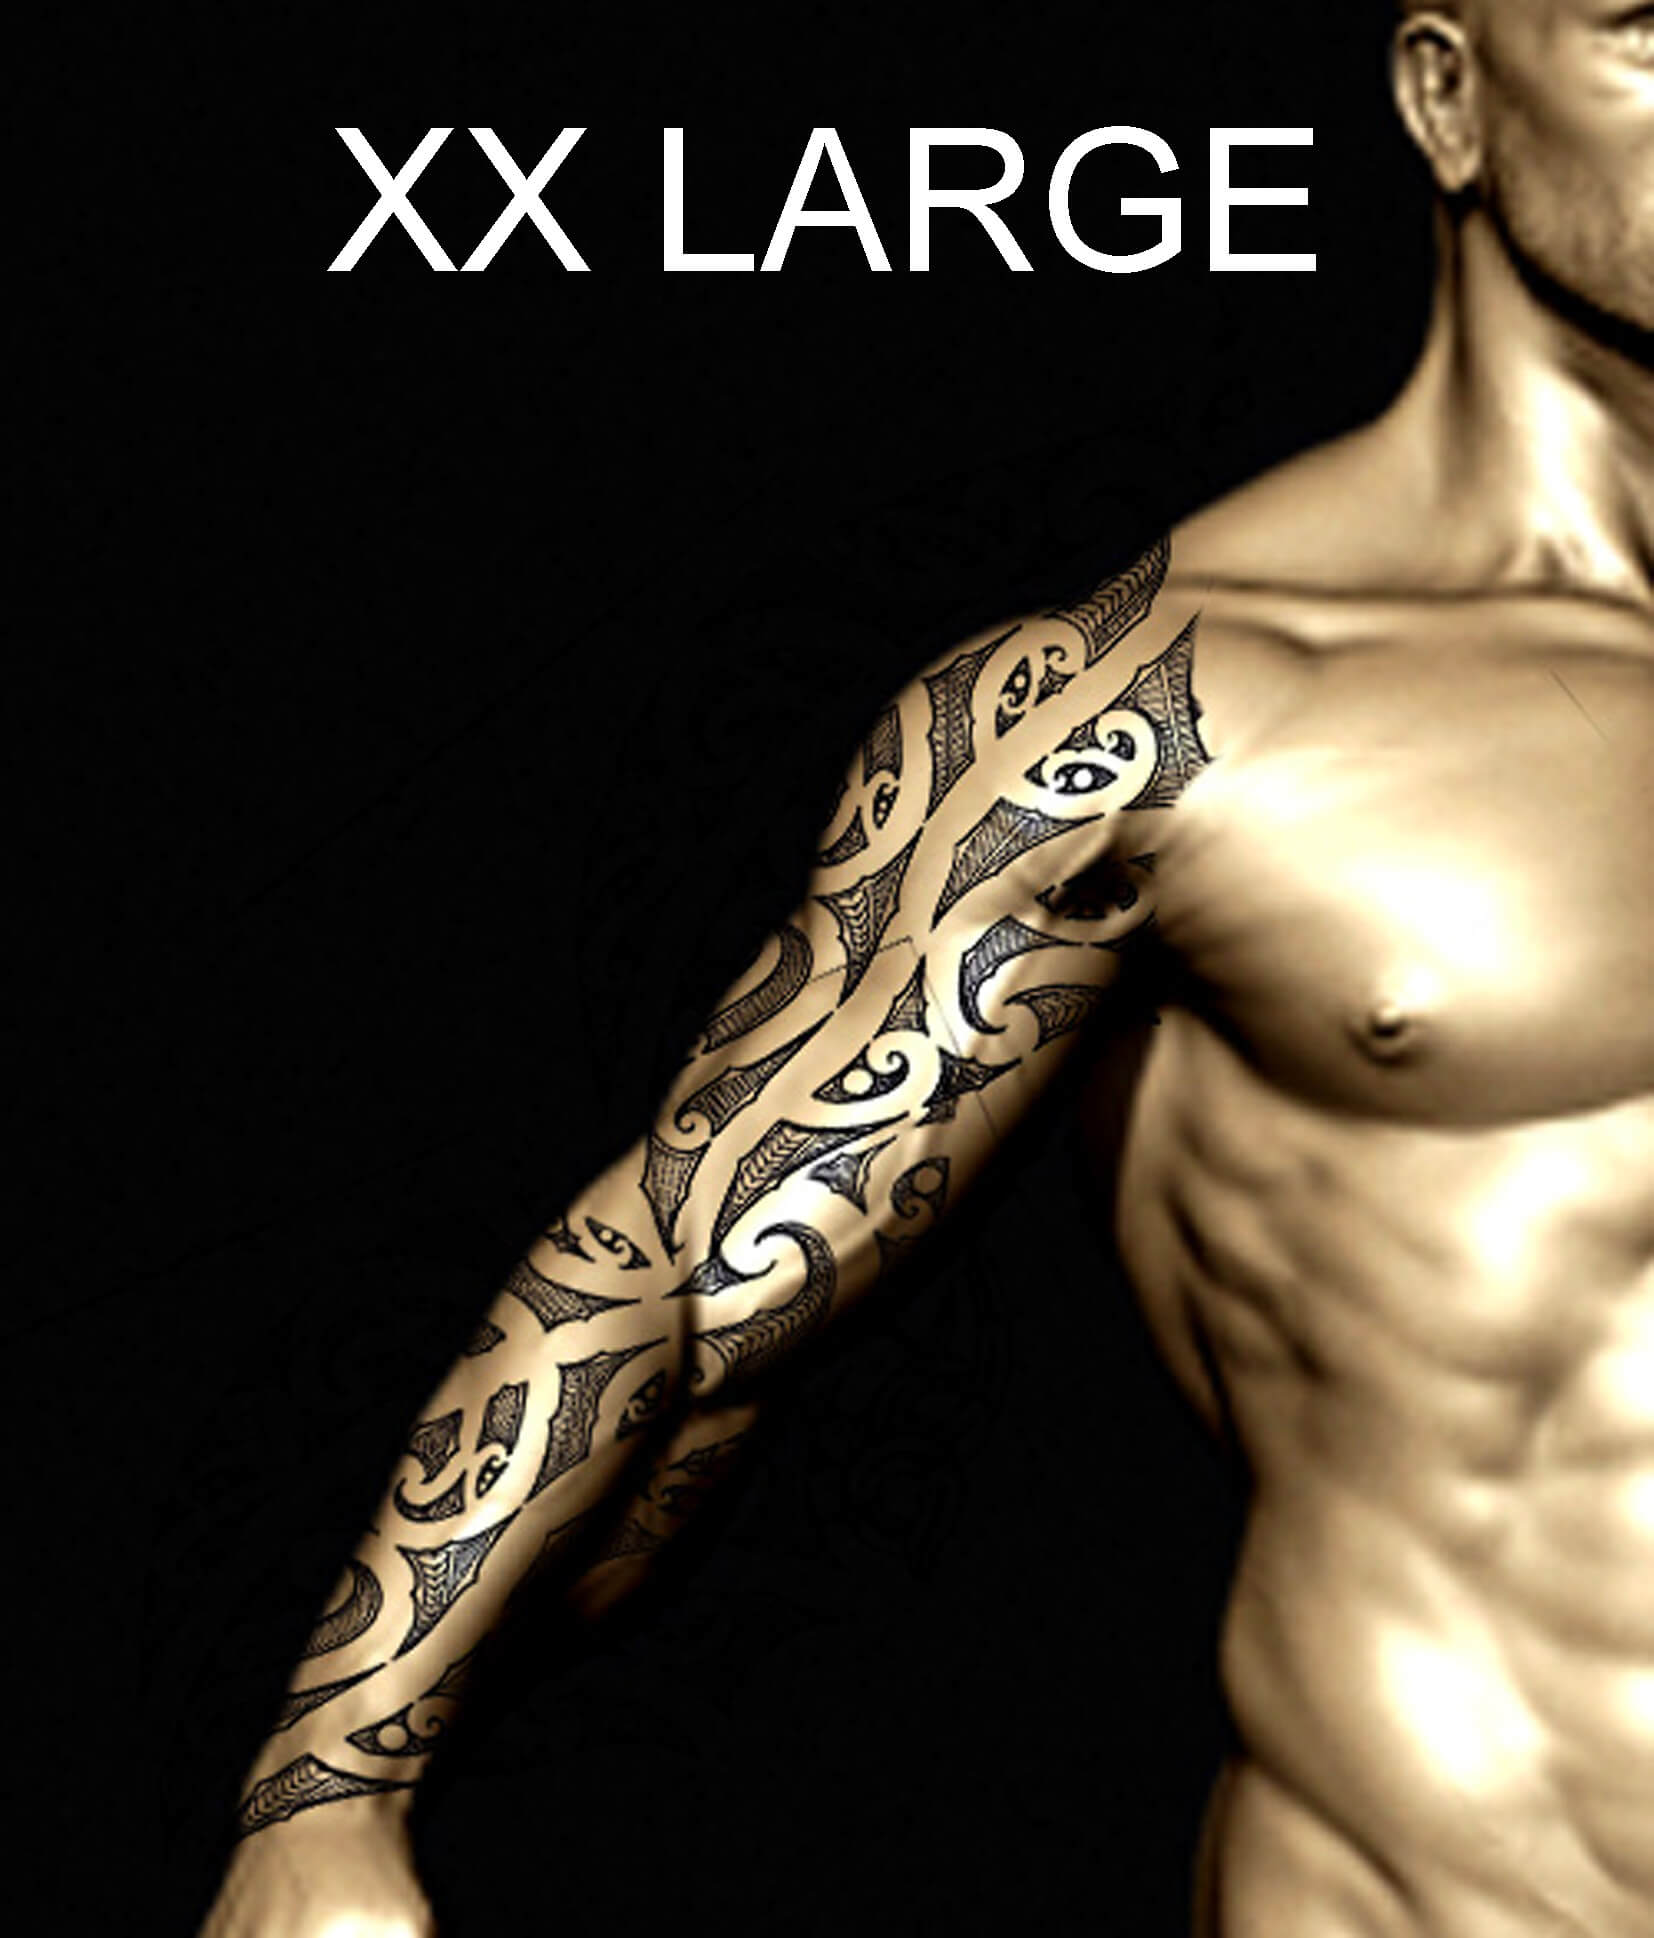 Male Maori Tribal Tattoos Full Body: Order Your Authentic & Personalised Maori Or Polynesian